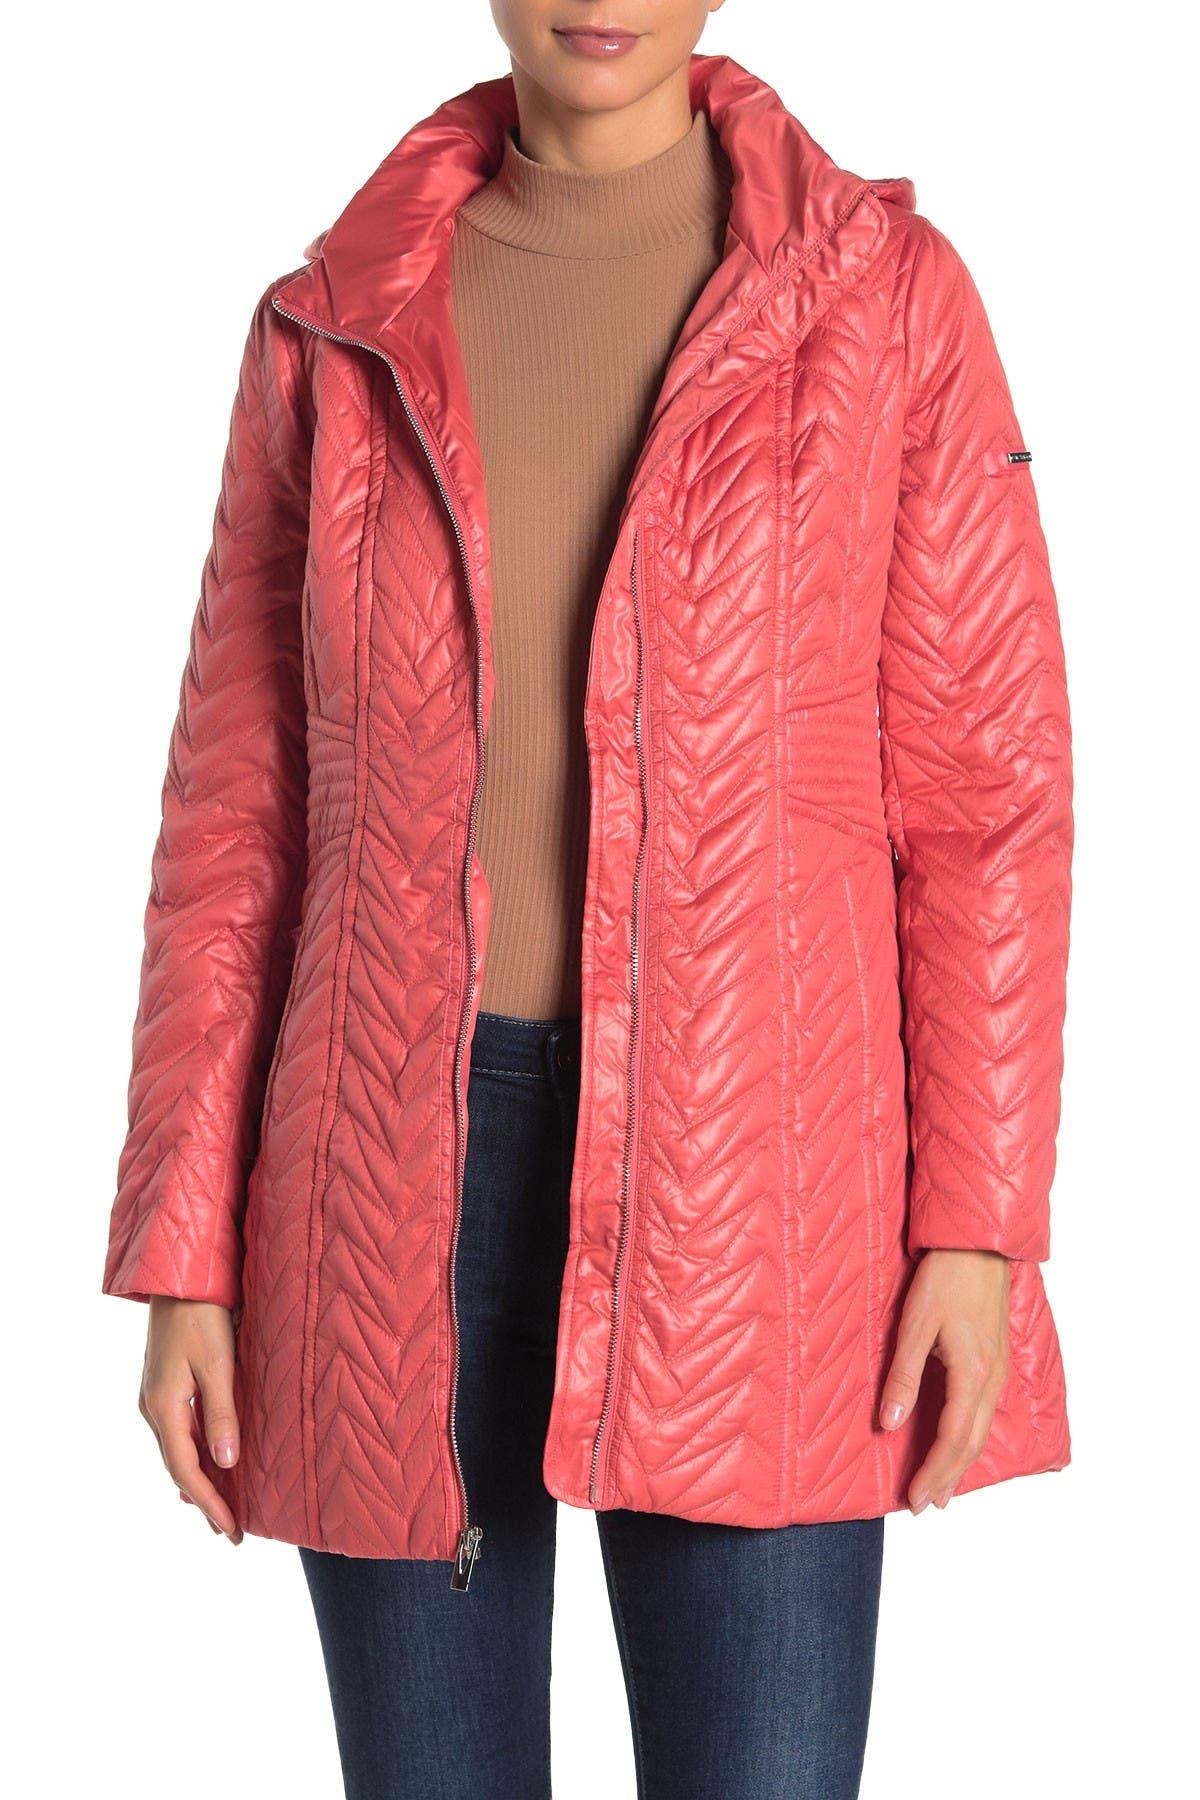 Image of Via Spiga Zigzag Quilted Detachable Hood Jacket